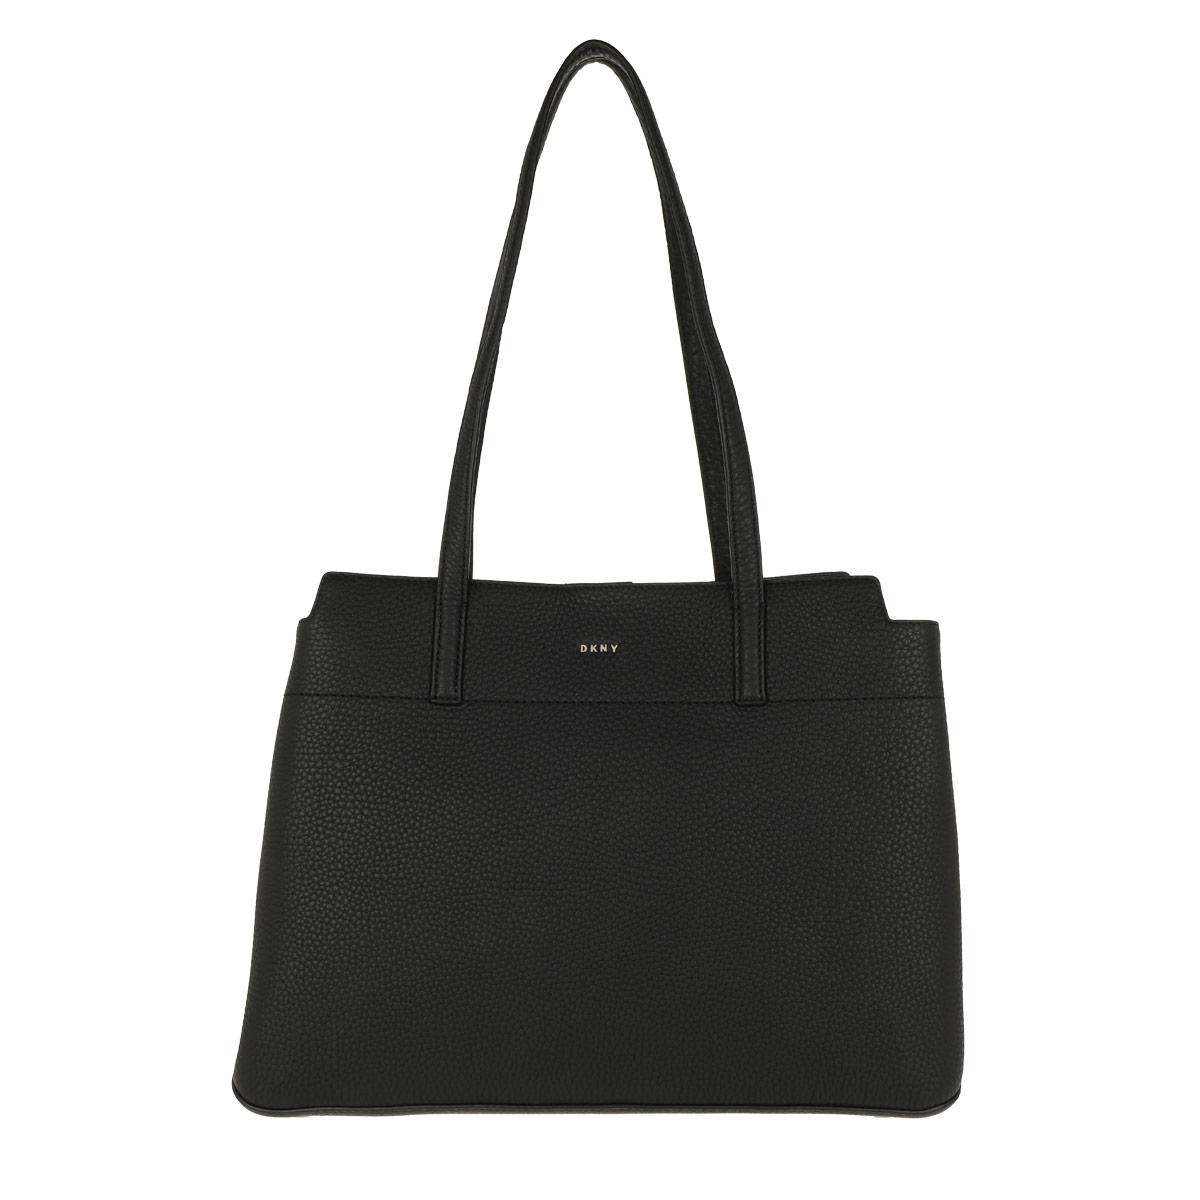 DKNY Tote - Bellah LG Tote Black/Gold - in schwarz - für Damen